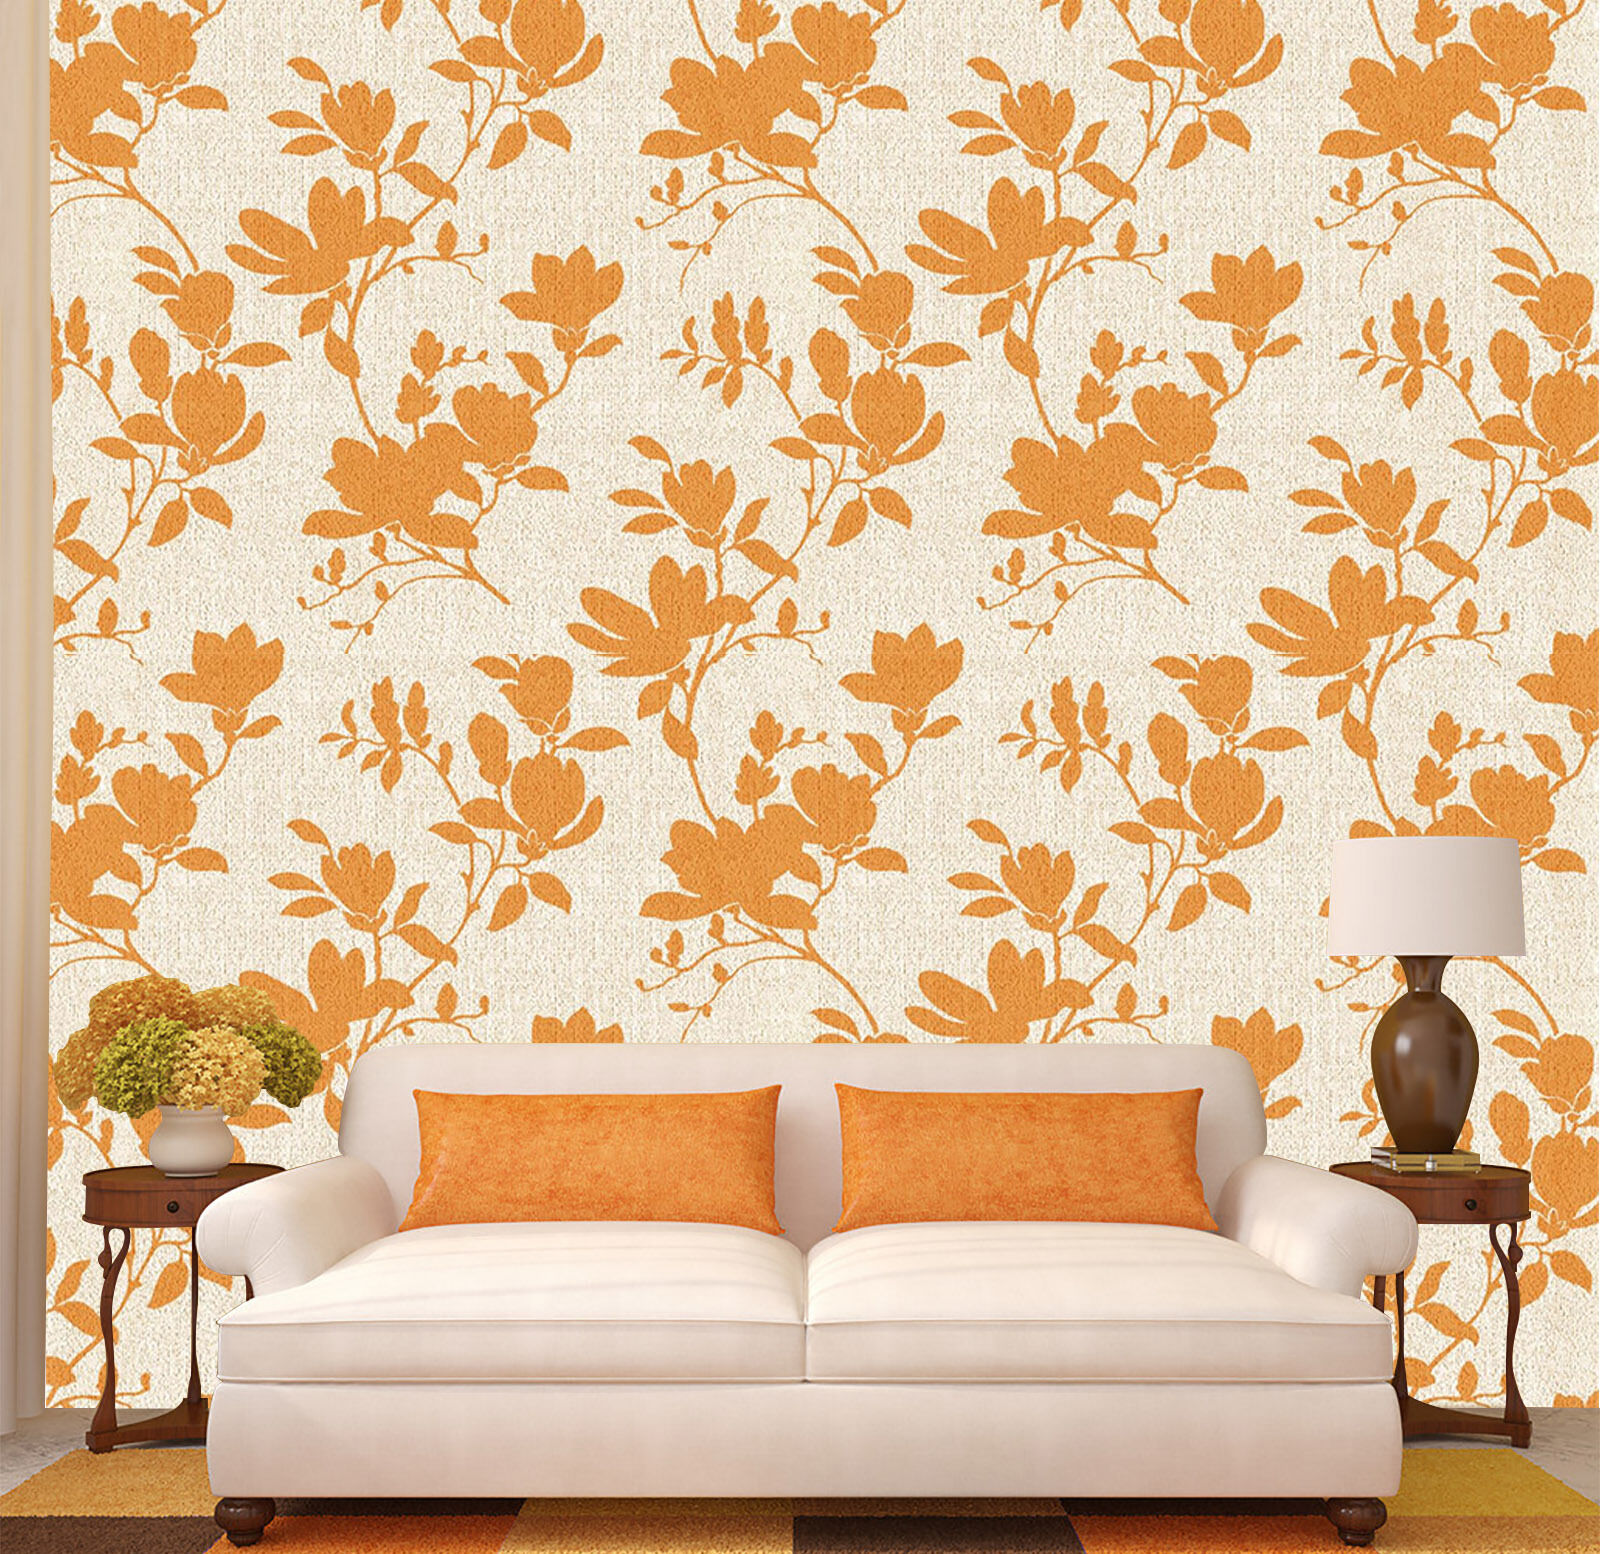 3D Gelbes Muster, Muster 254 Fototapeten Wandbild Bild Tapete Familie Kinder